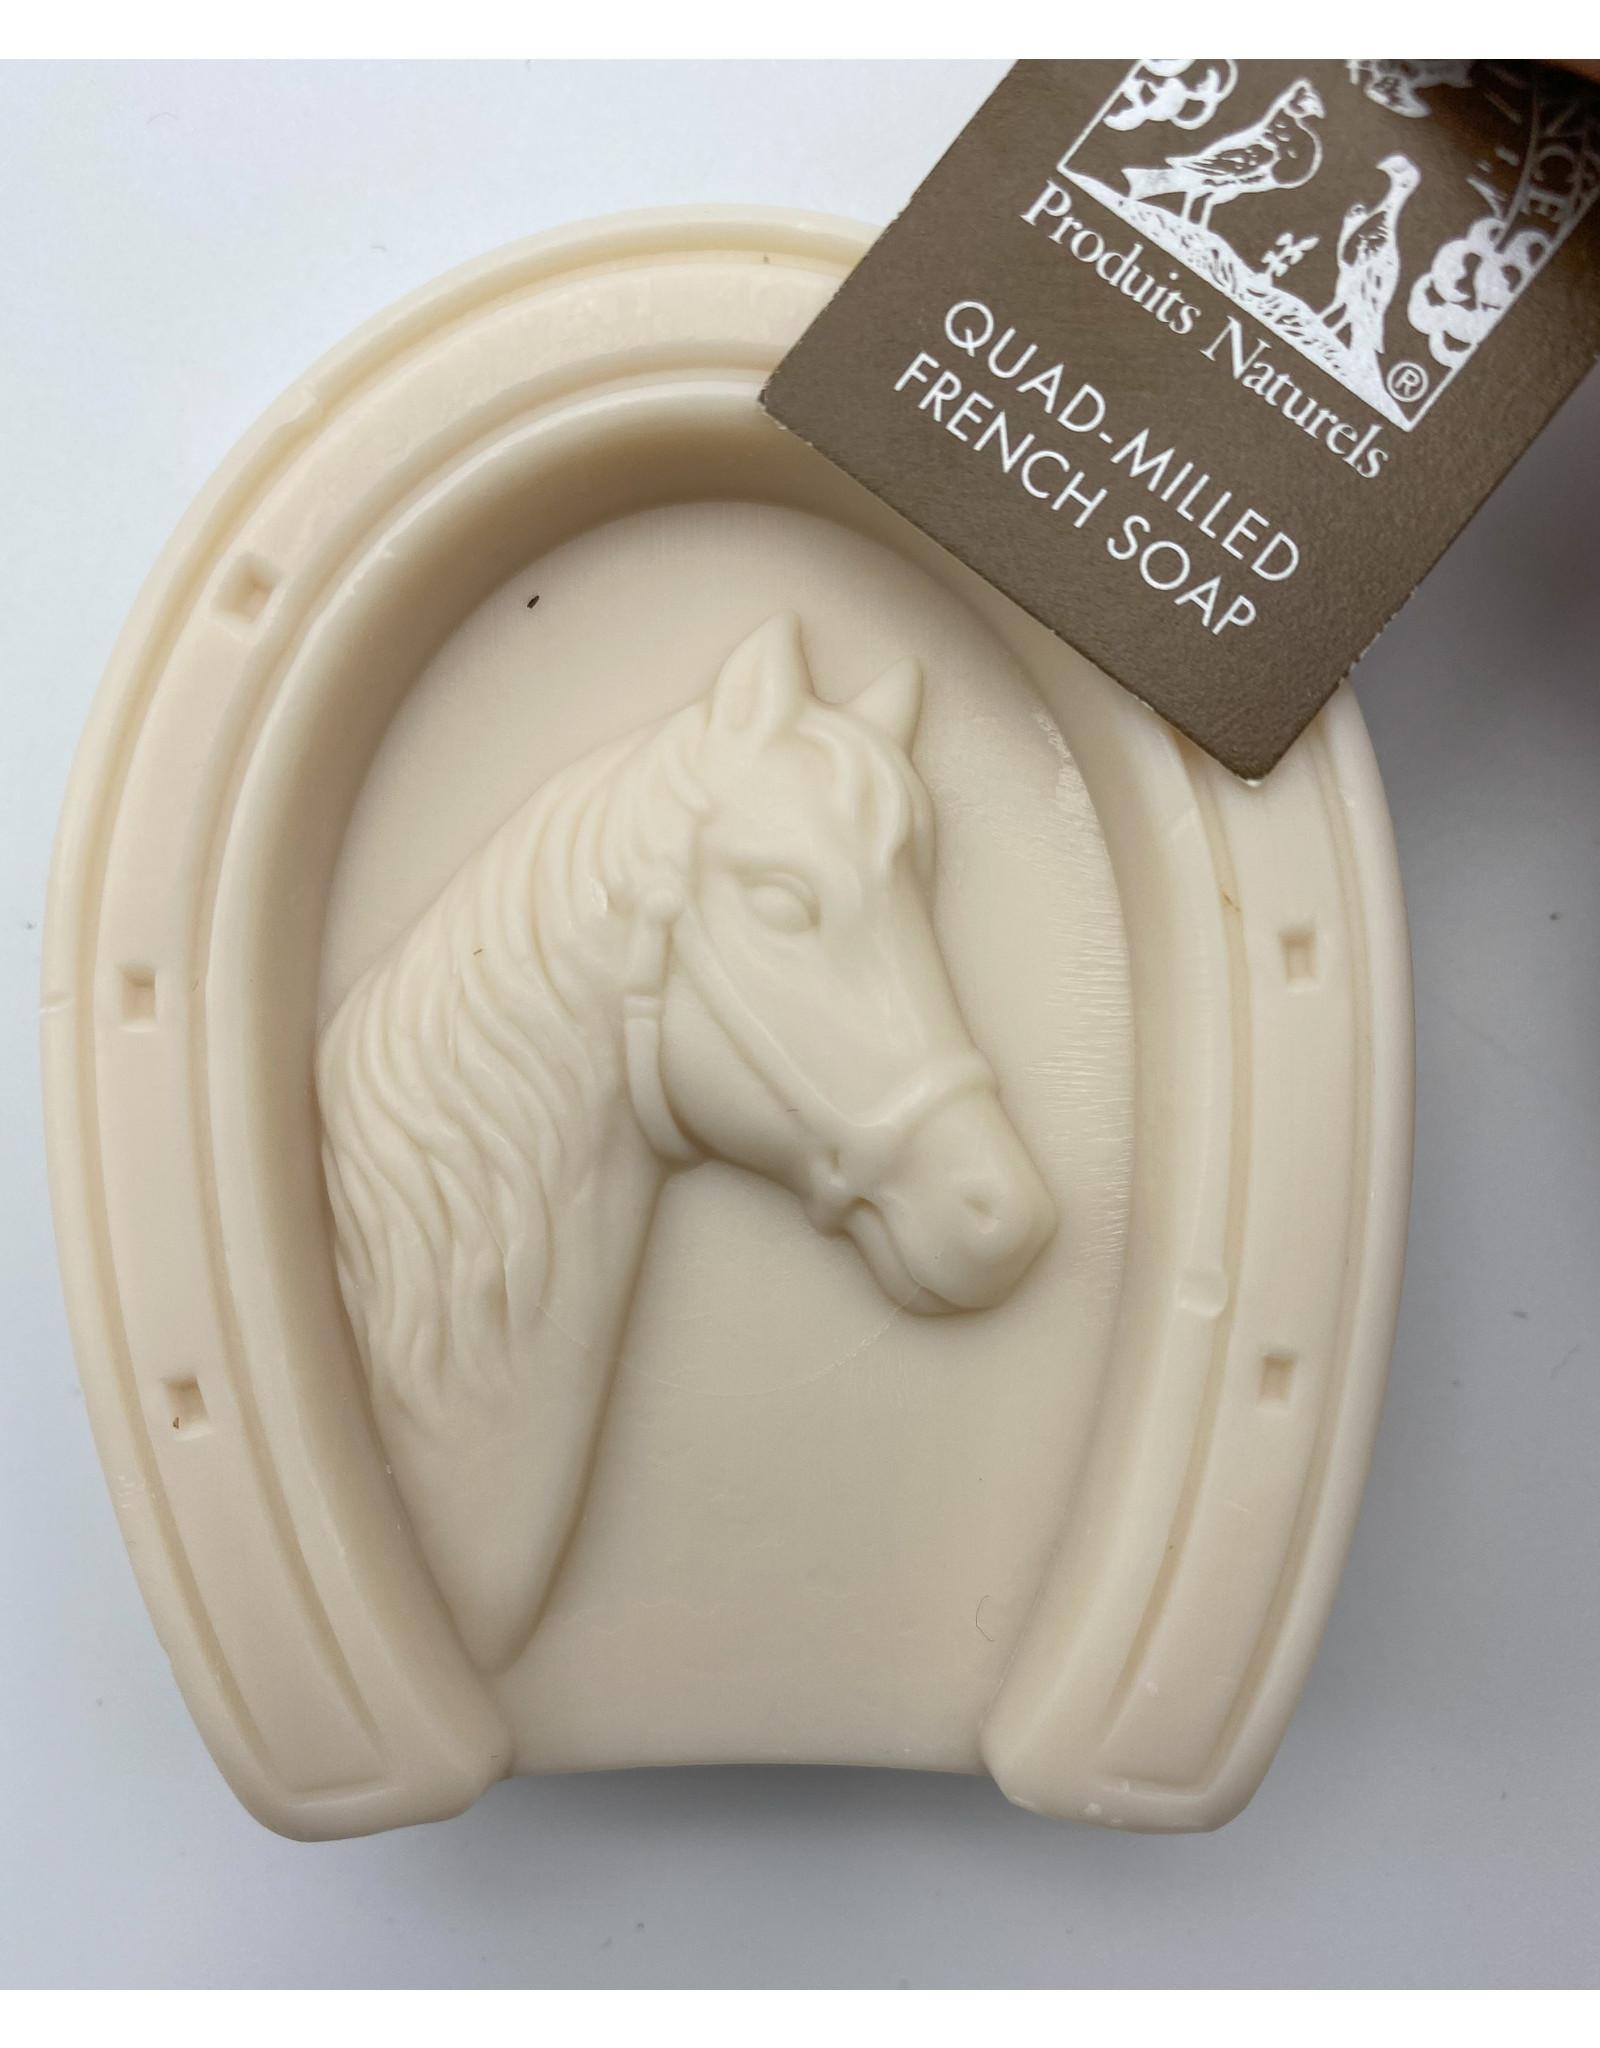 Horseshoe Almond Bar Soap